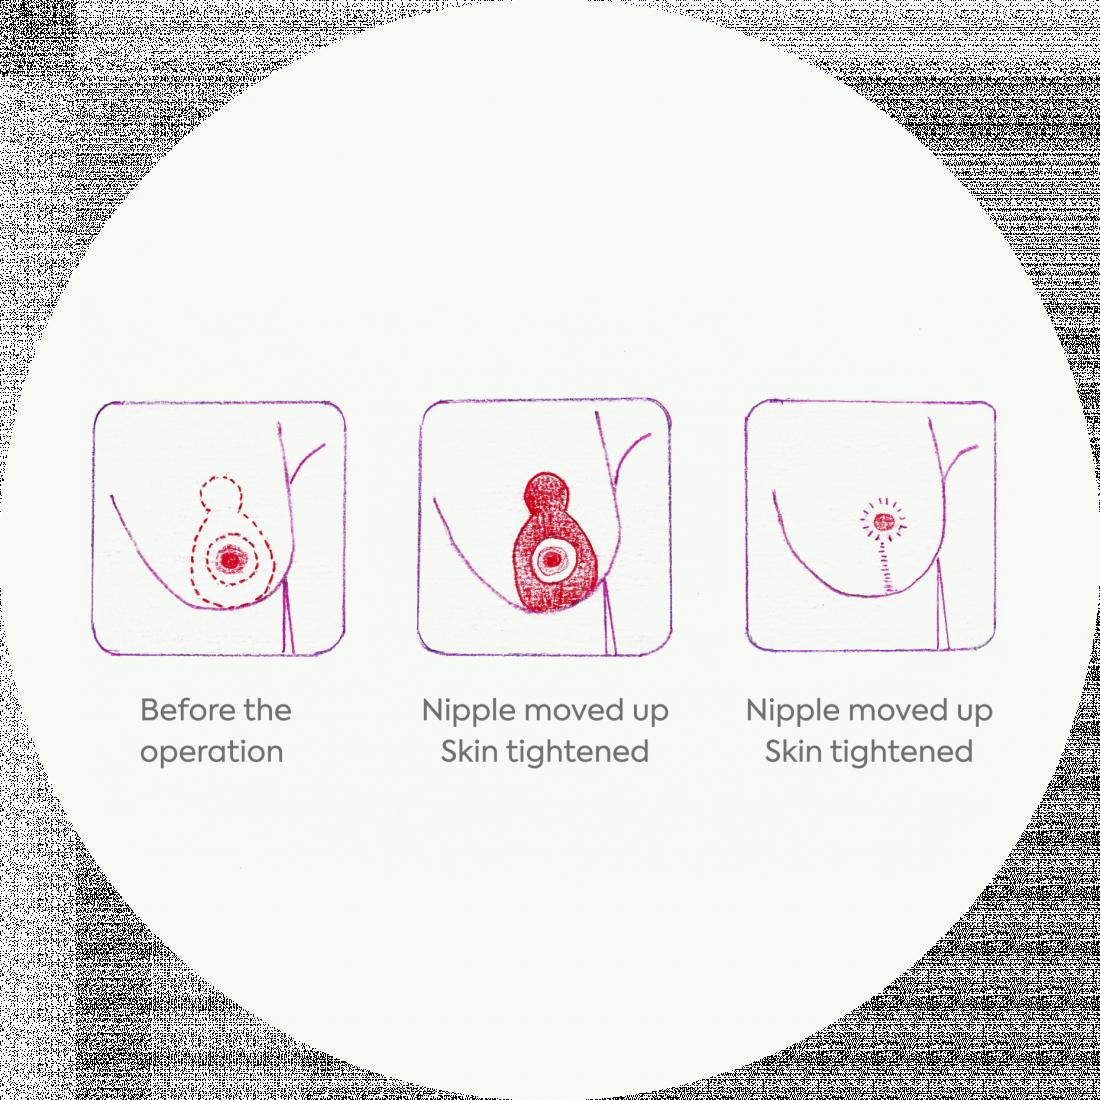 Procedure details: Breast Lift